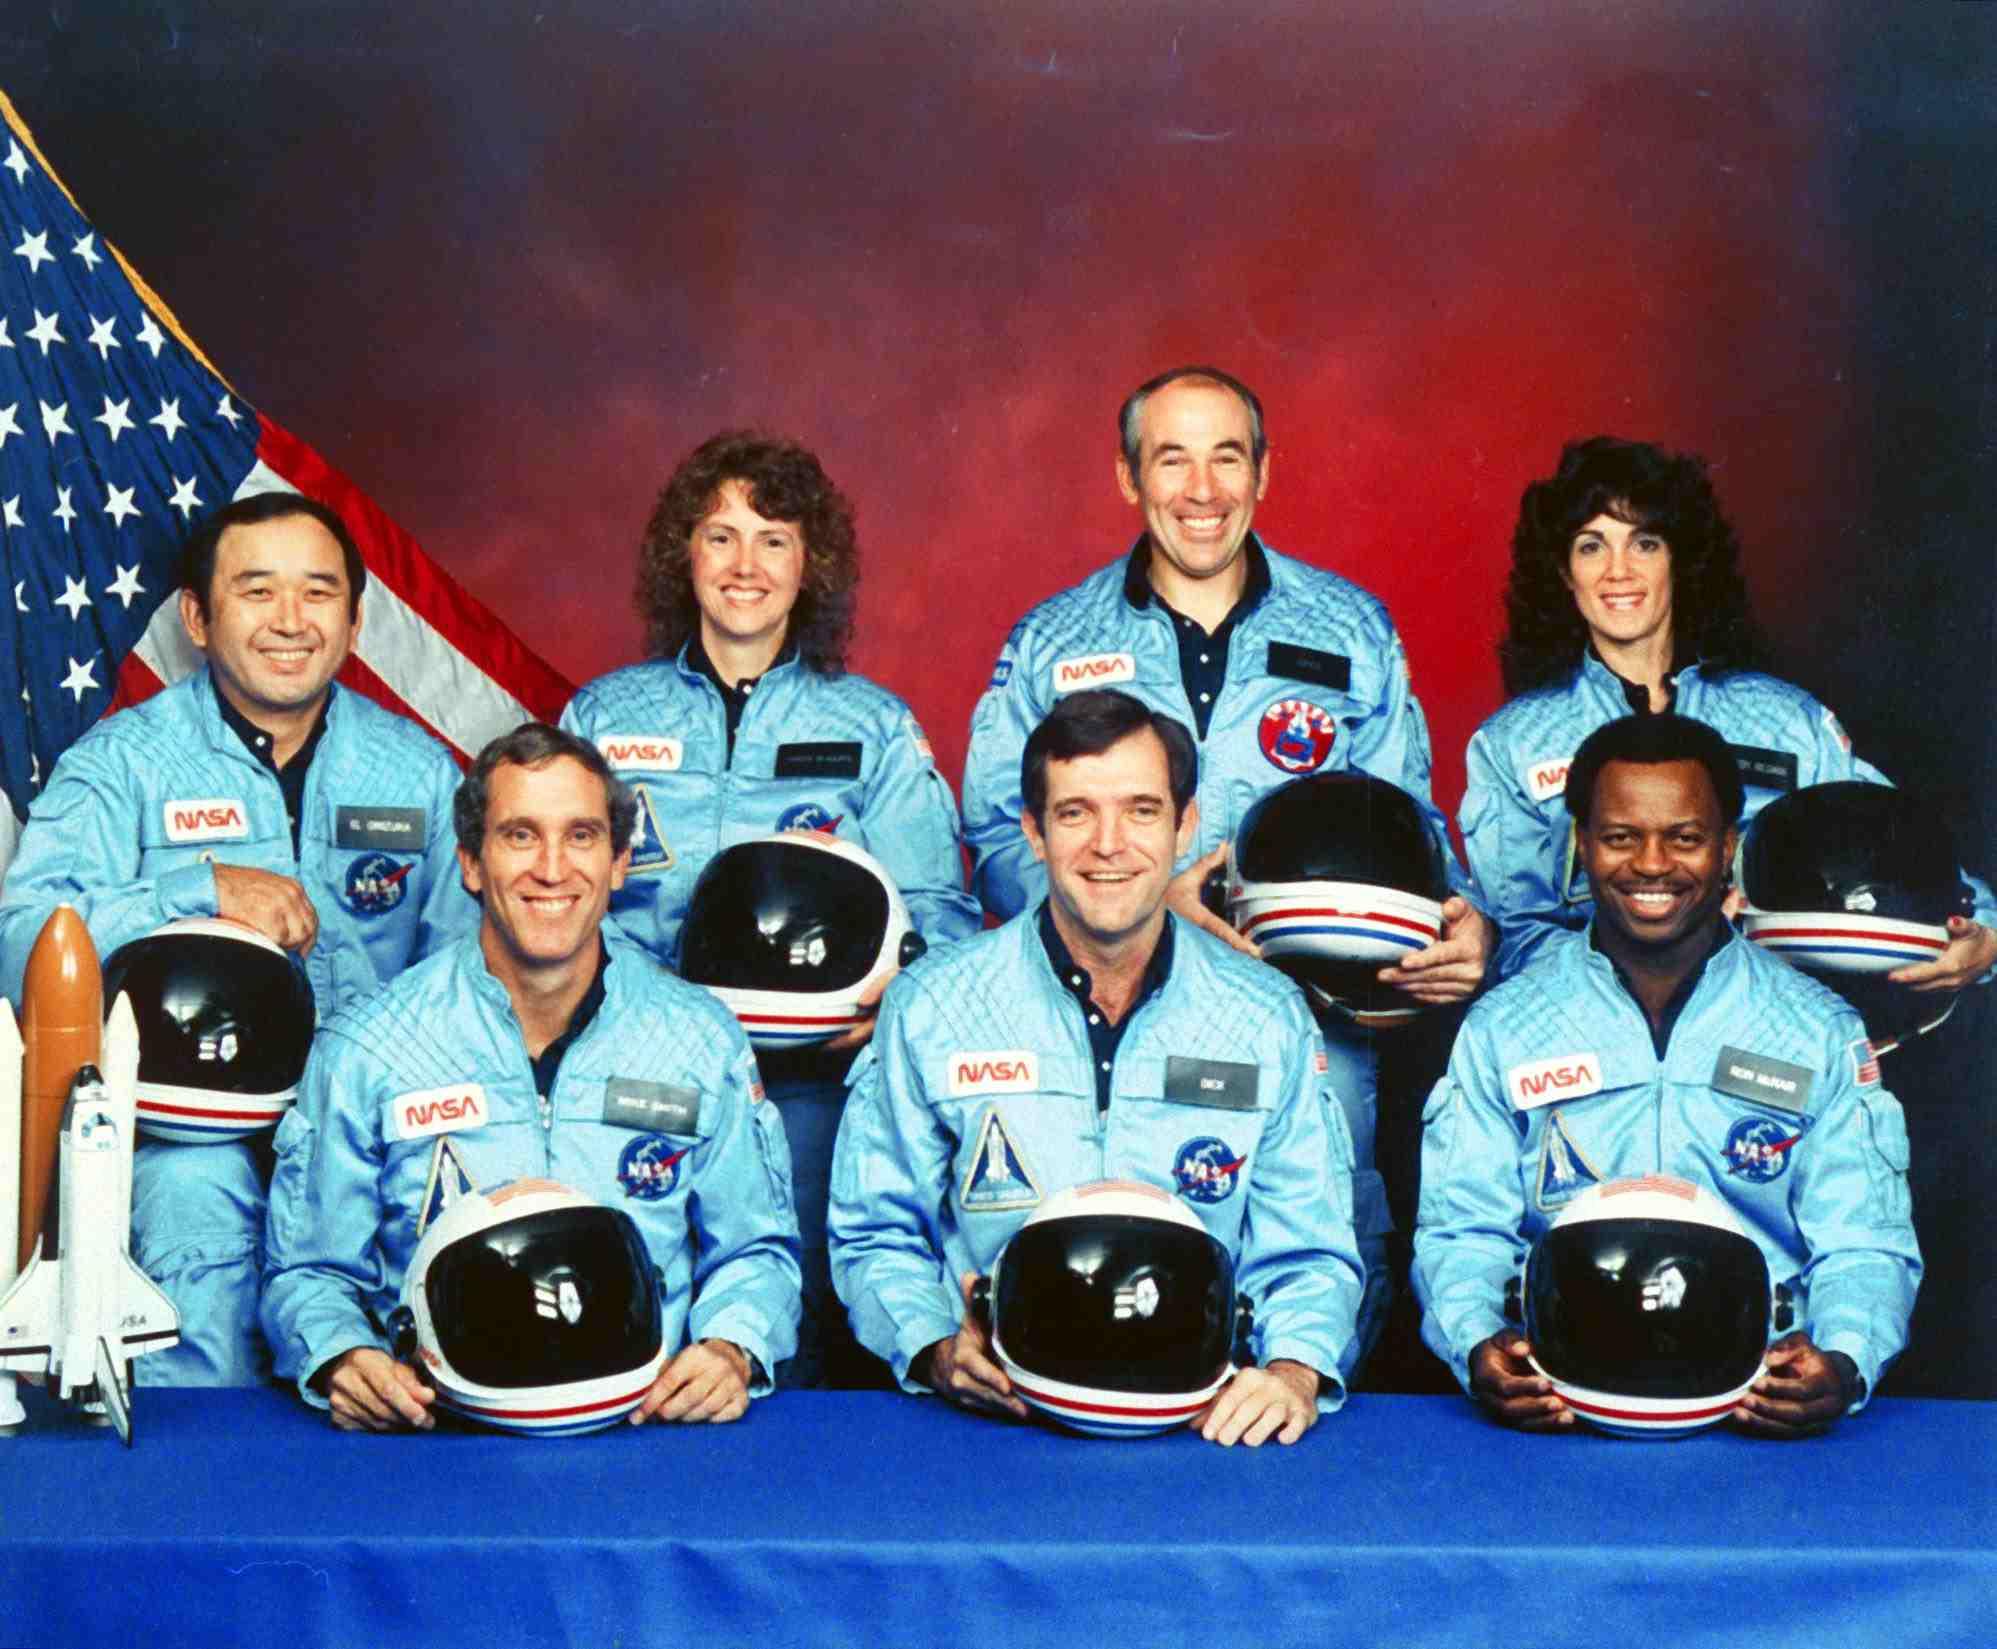 Sharon Christa Mcauliffe;Ronald E. Mcnair;Gregory Jarvis;Ellison Onizuka;Michael J. Smith;Francis R. Scobee;Judith A. Resnik